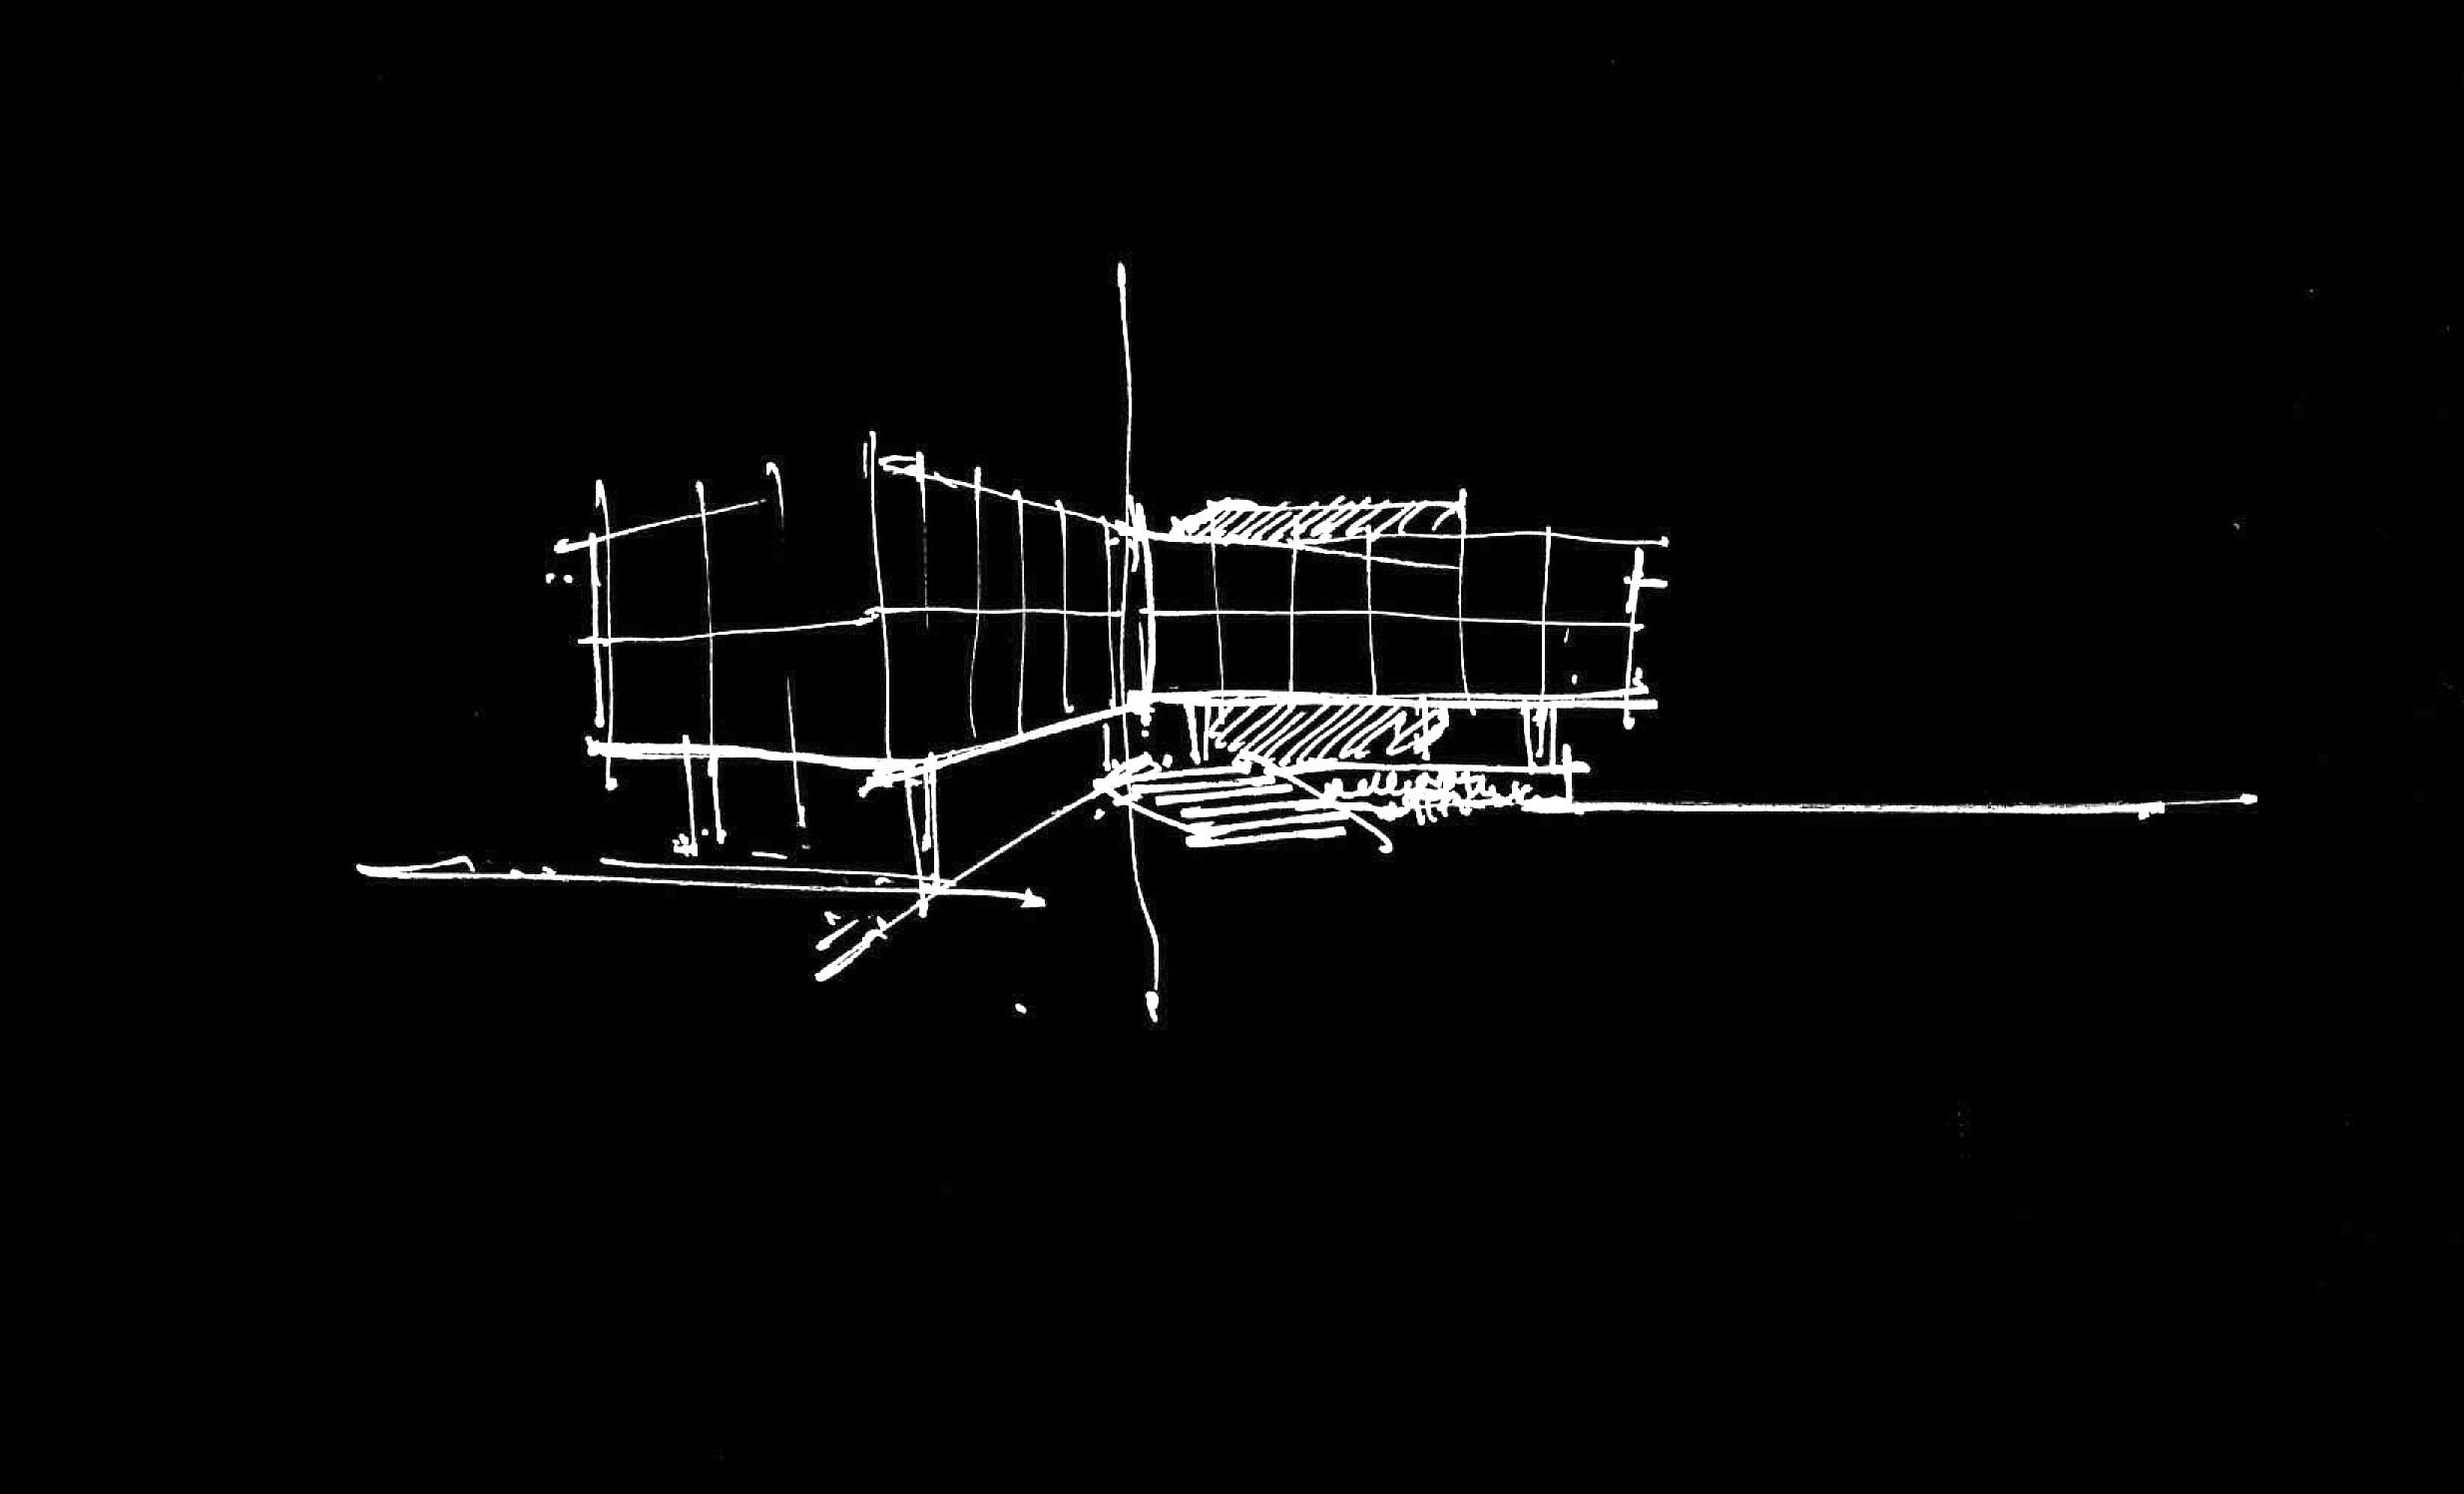 McKinley Burkart_Mark Burkart_Sketch (1)_inverted.jpg